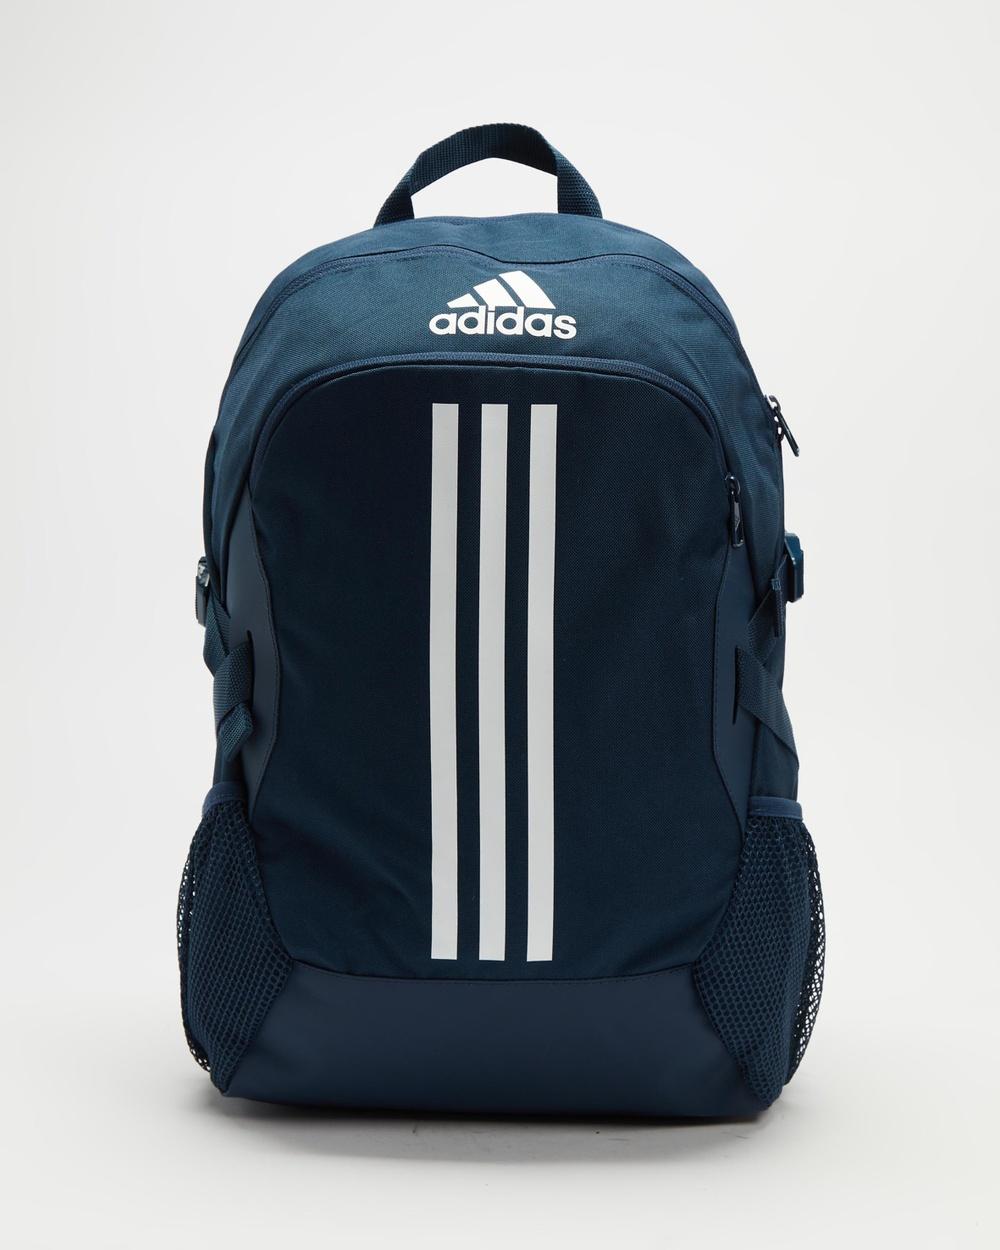 adidas Performance Power 5 Backpack Backpacks Crew Navy & White